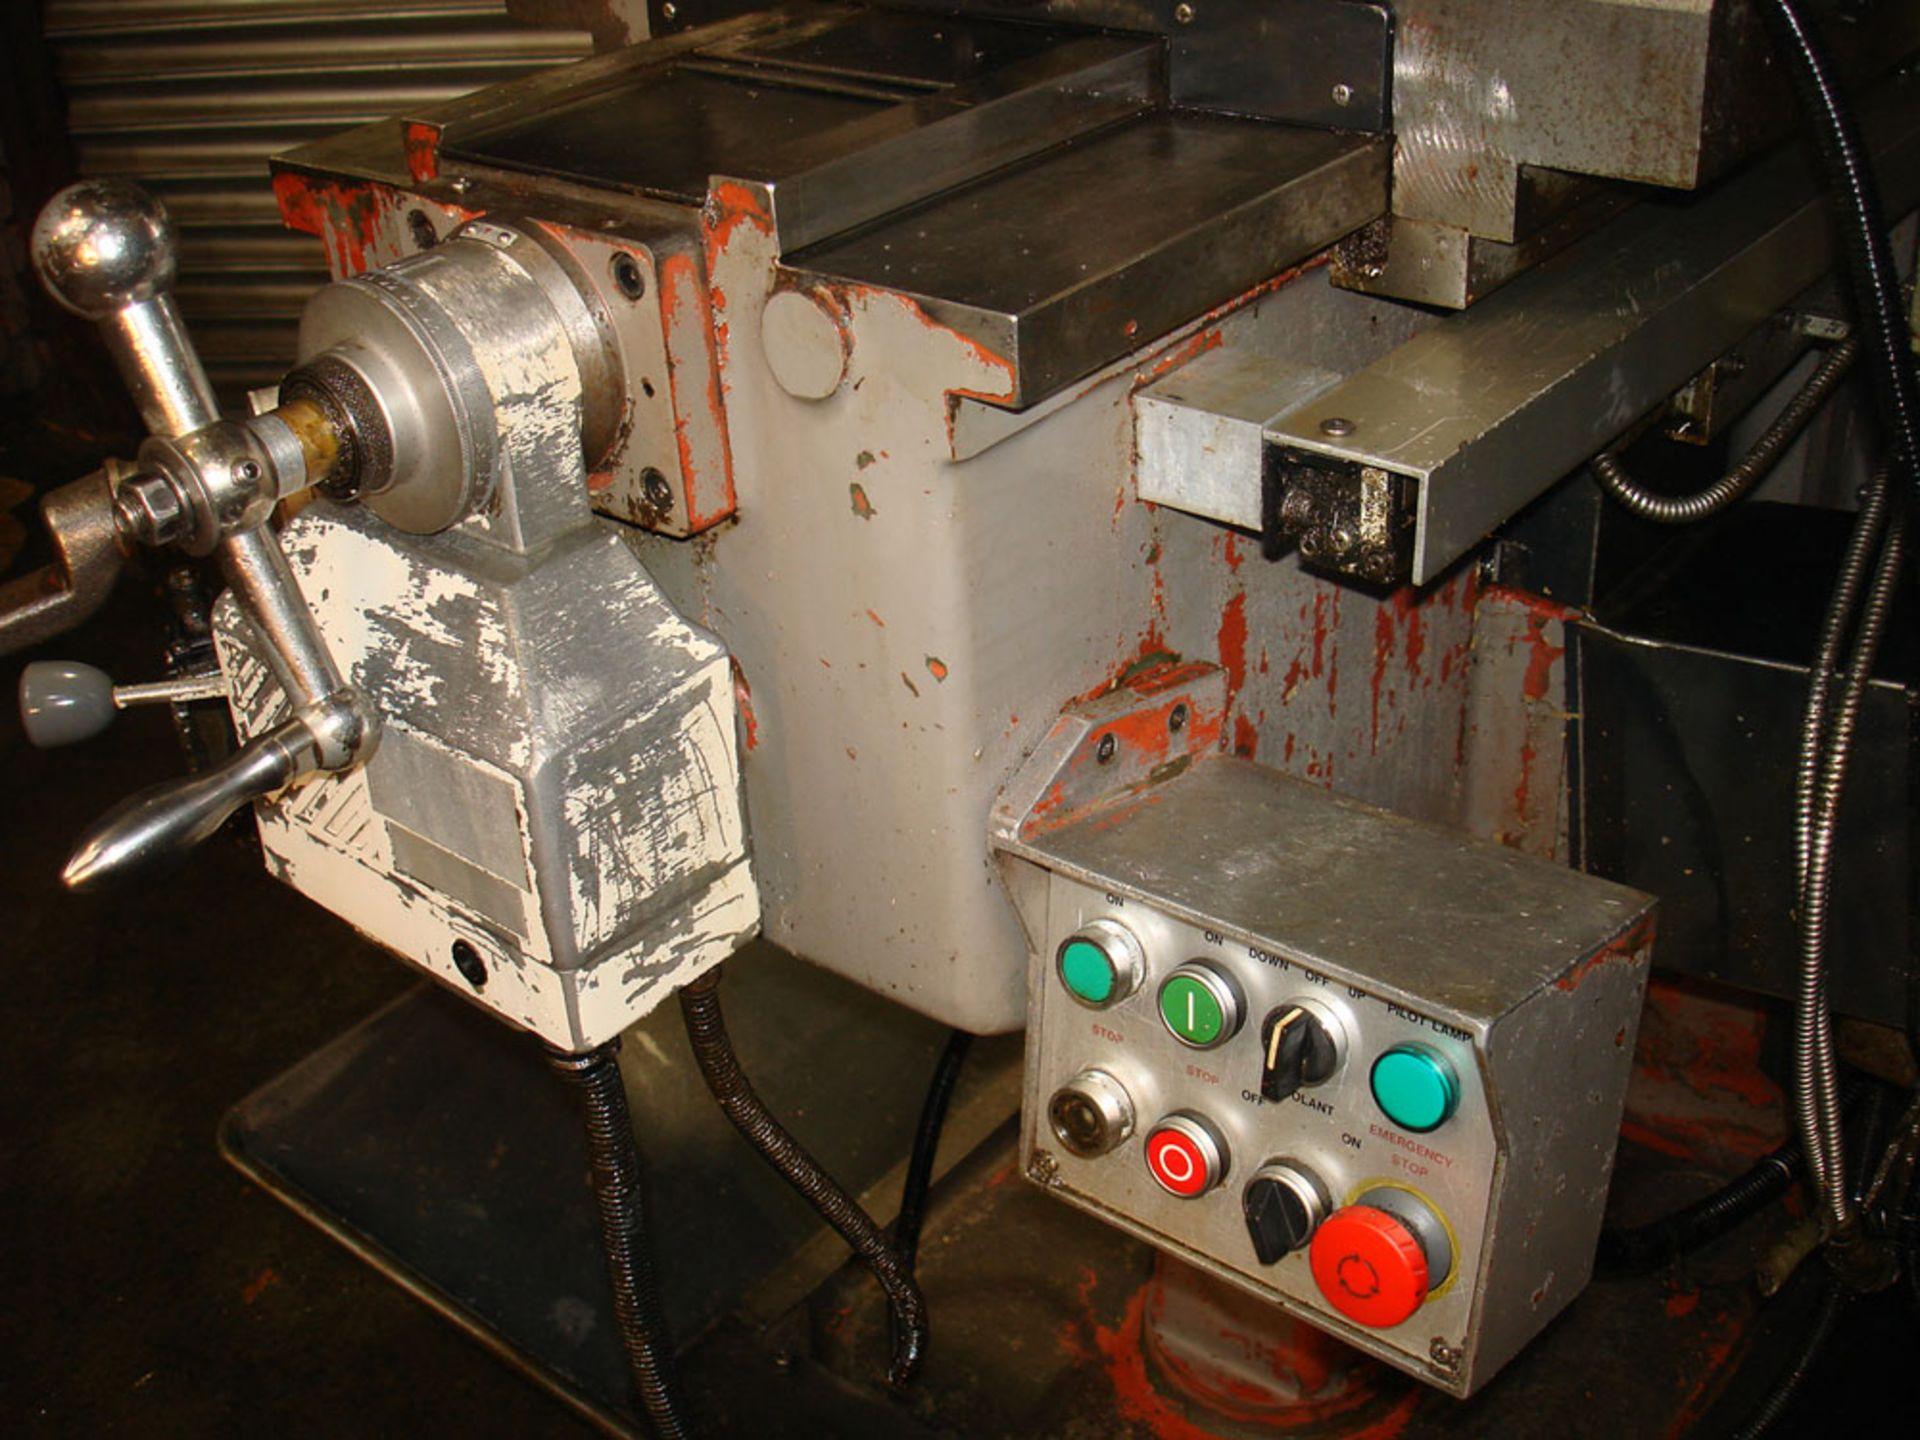 KRV 3000 SLV Turret Milling Machine. Table Size 1473 x 305mm. - Image 6 of 7